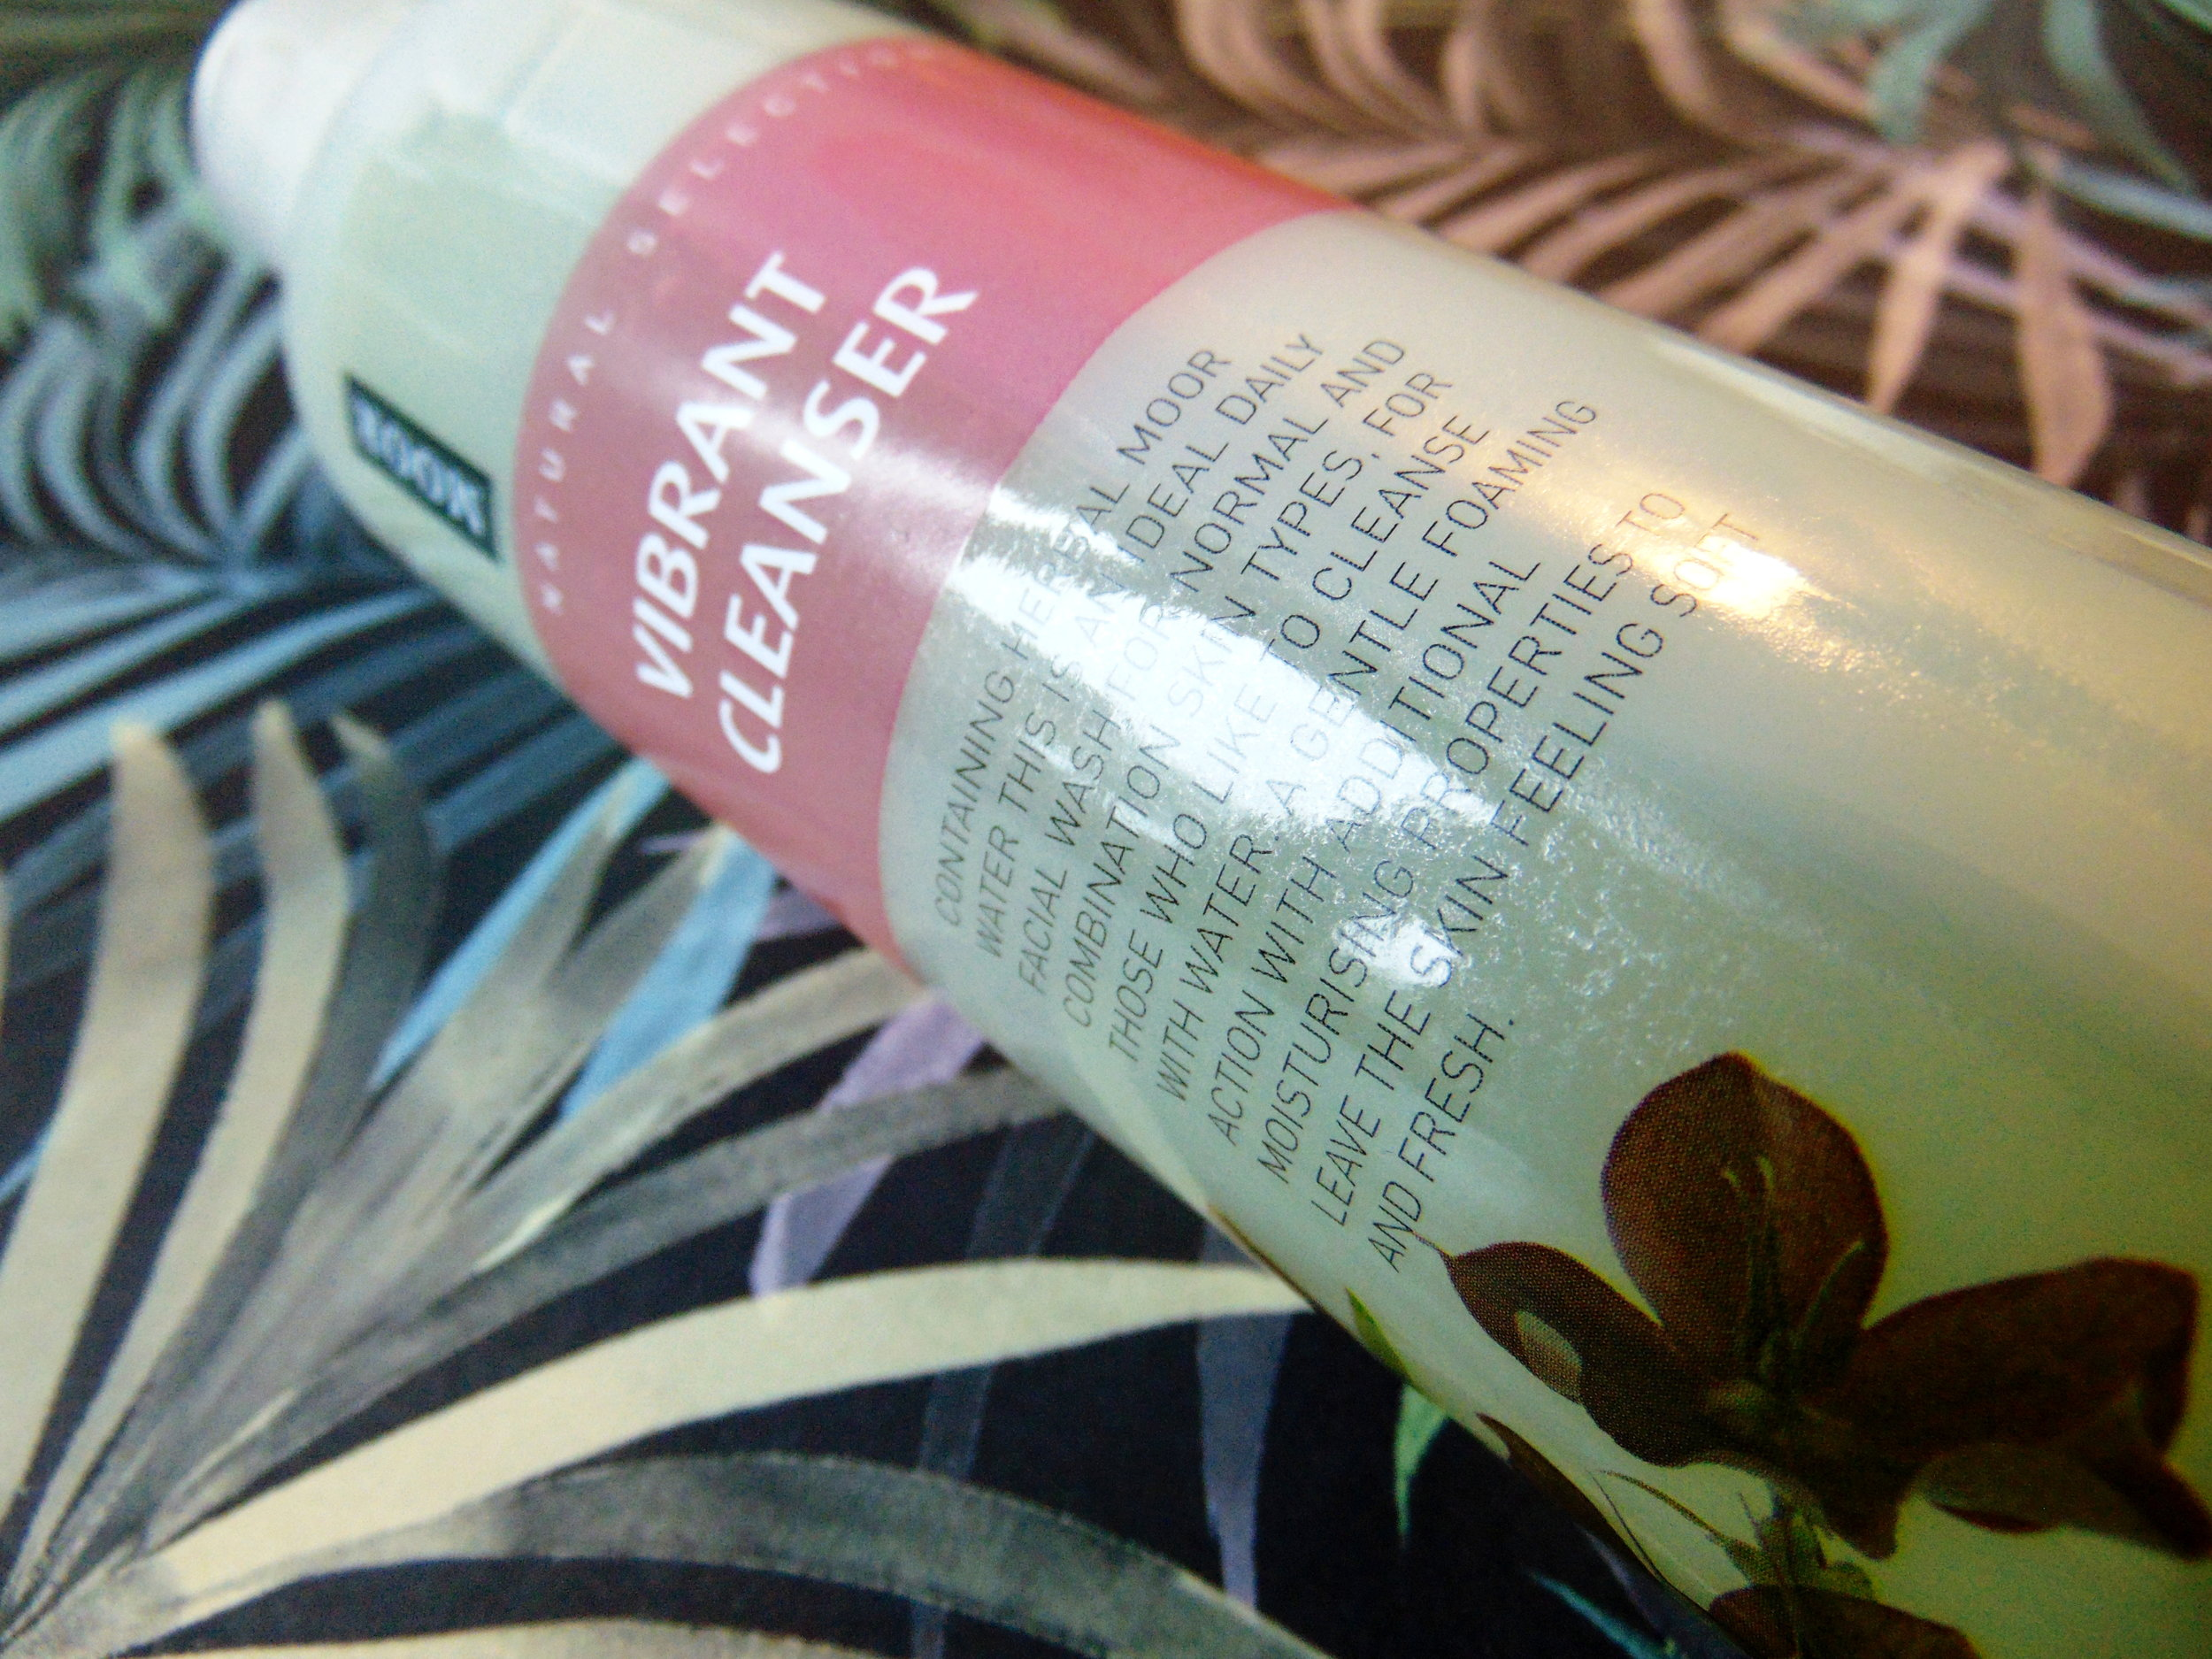 Venus-Beauty-Hair-Tavistock-Devon-Salon-Blog-Top-Tips-Facial-Care-Moor-SpaCleanse-Vibrant-Cleanser.JPG